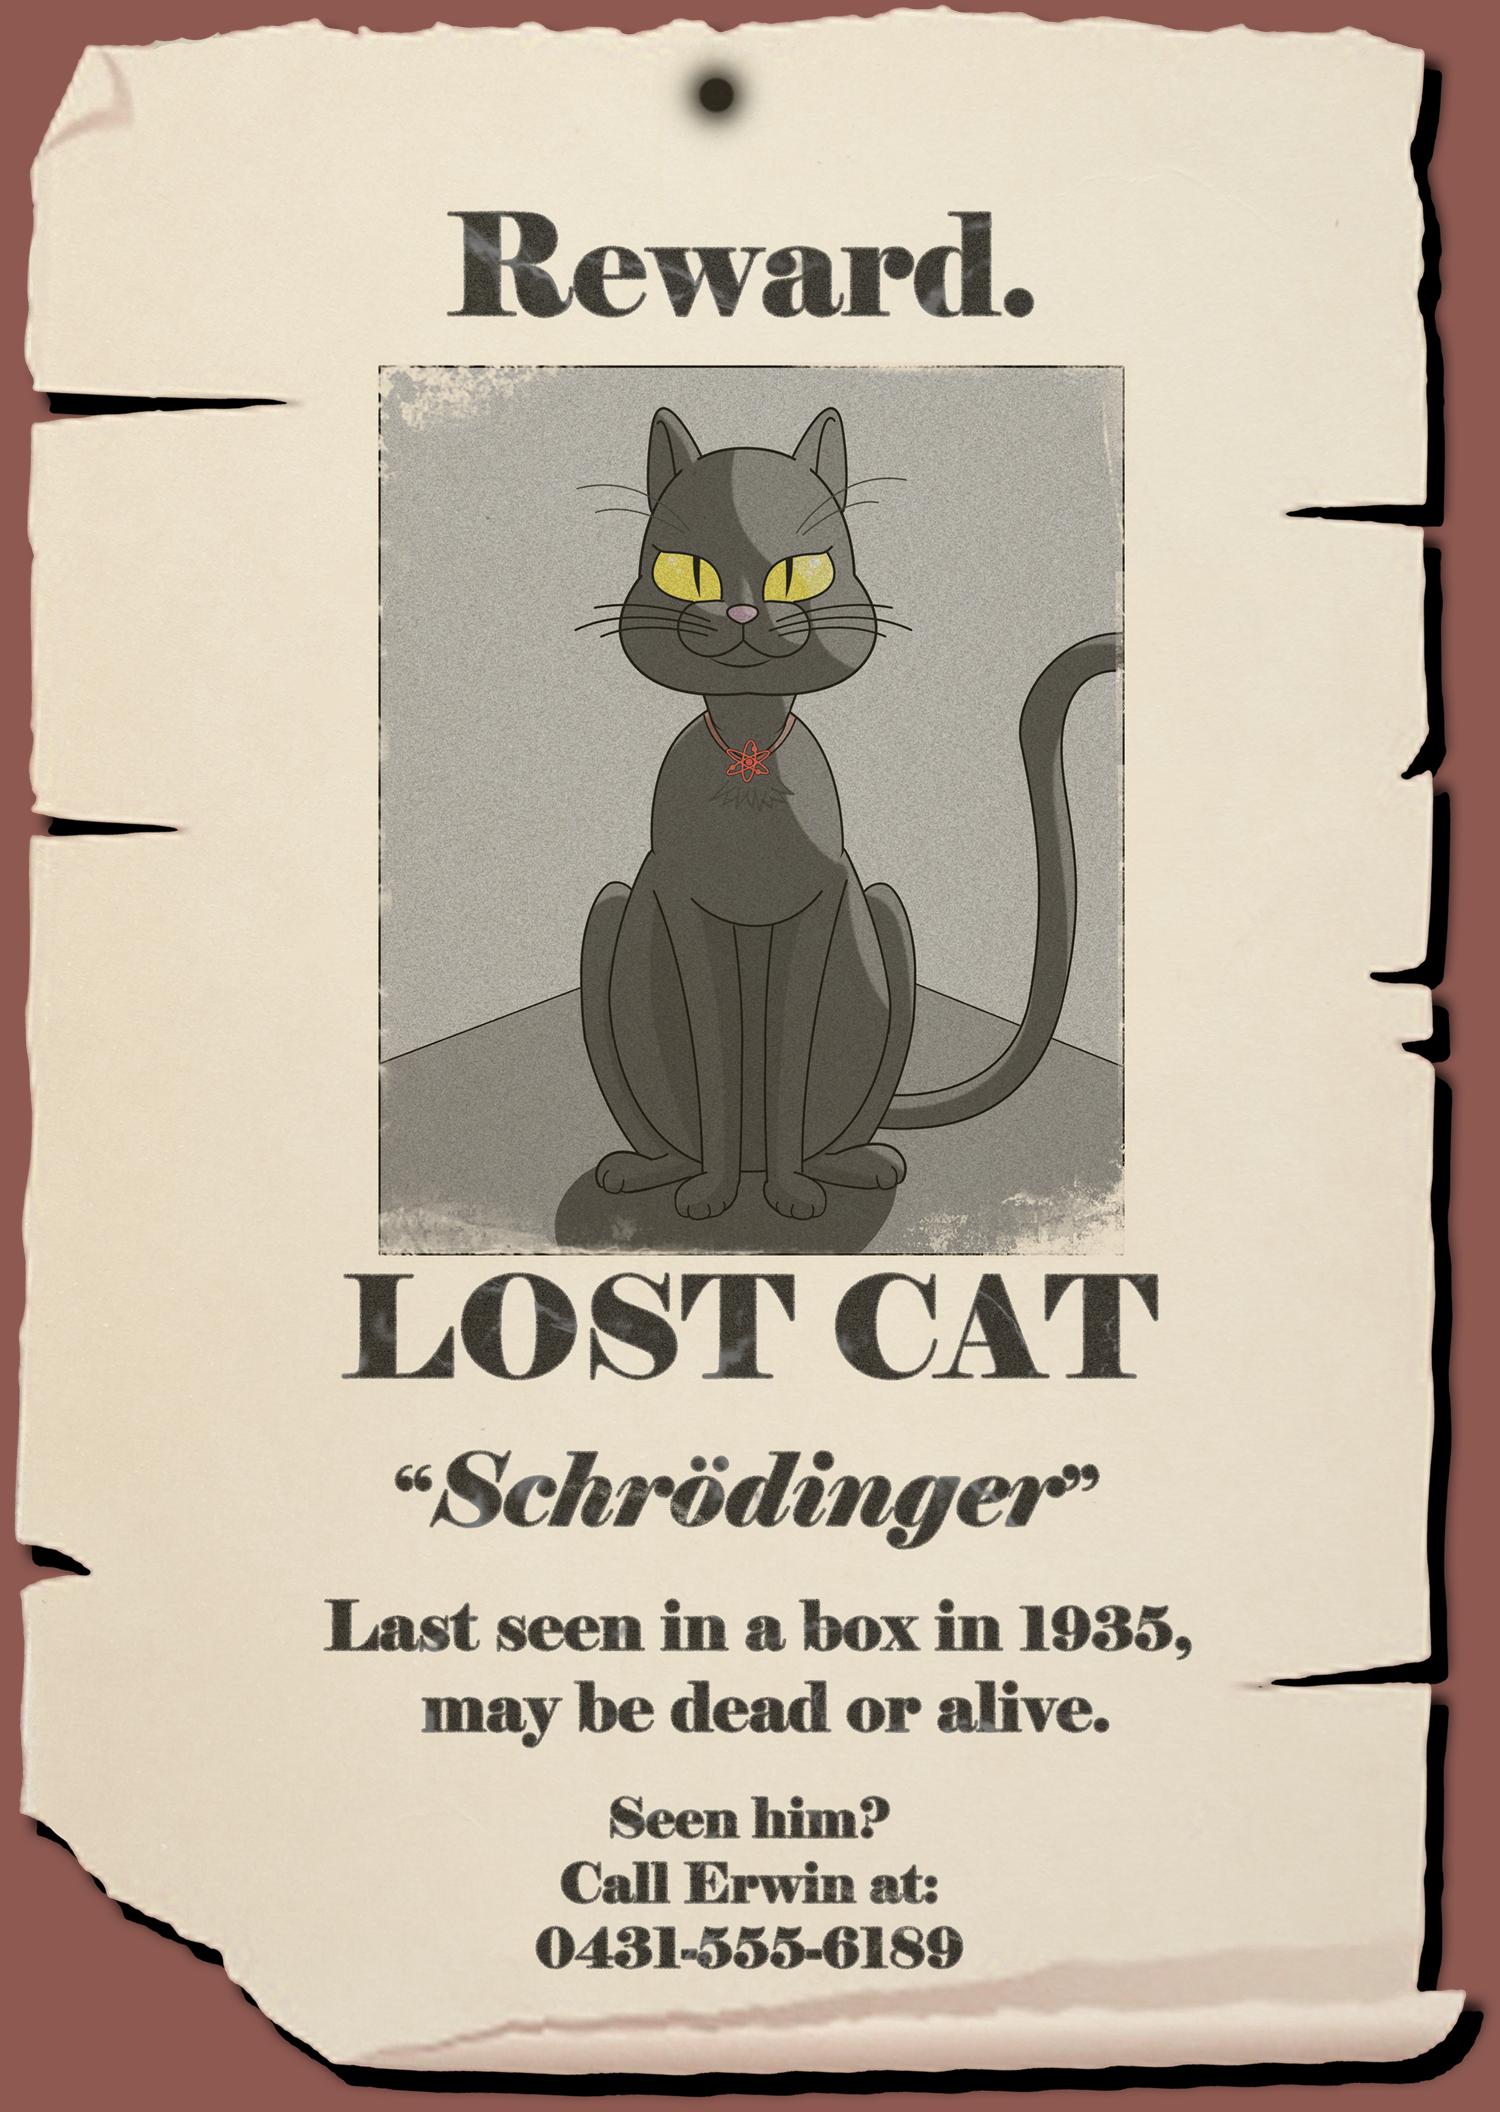 Schrodinger's cat by Tomsan on Newgrounds